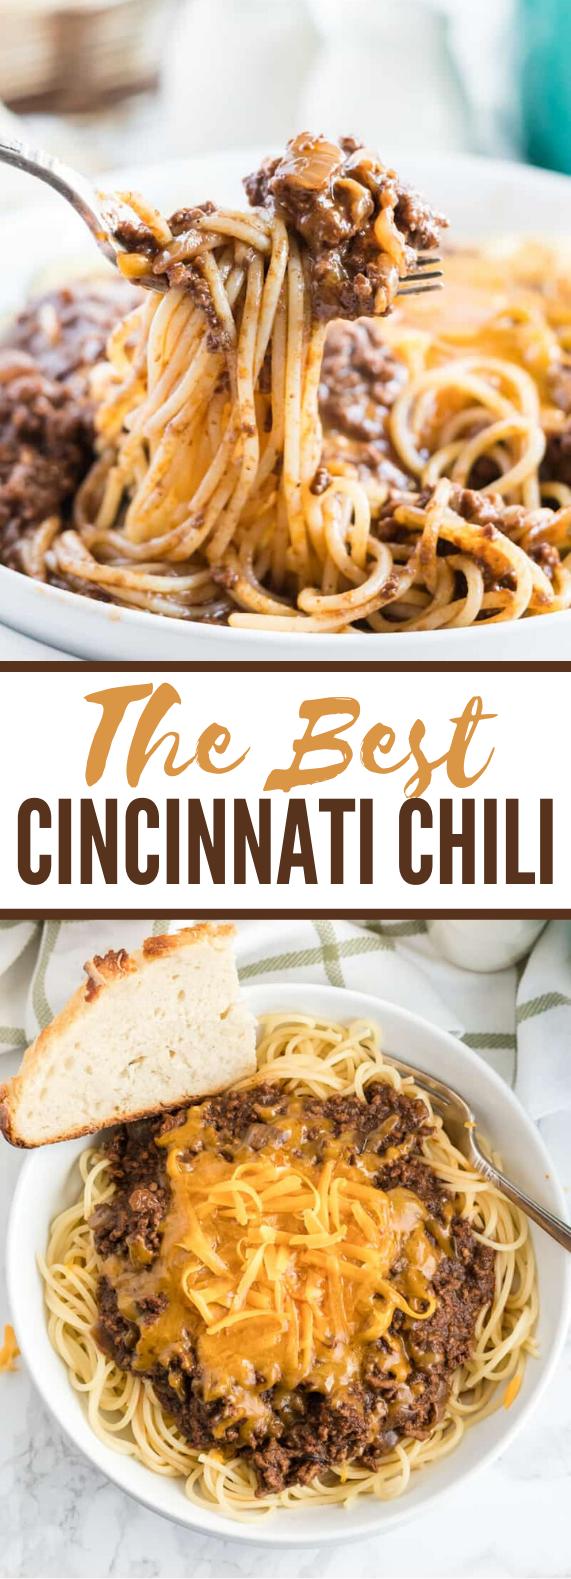 Cincinnati Chili #dinner #pasta